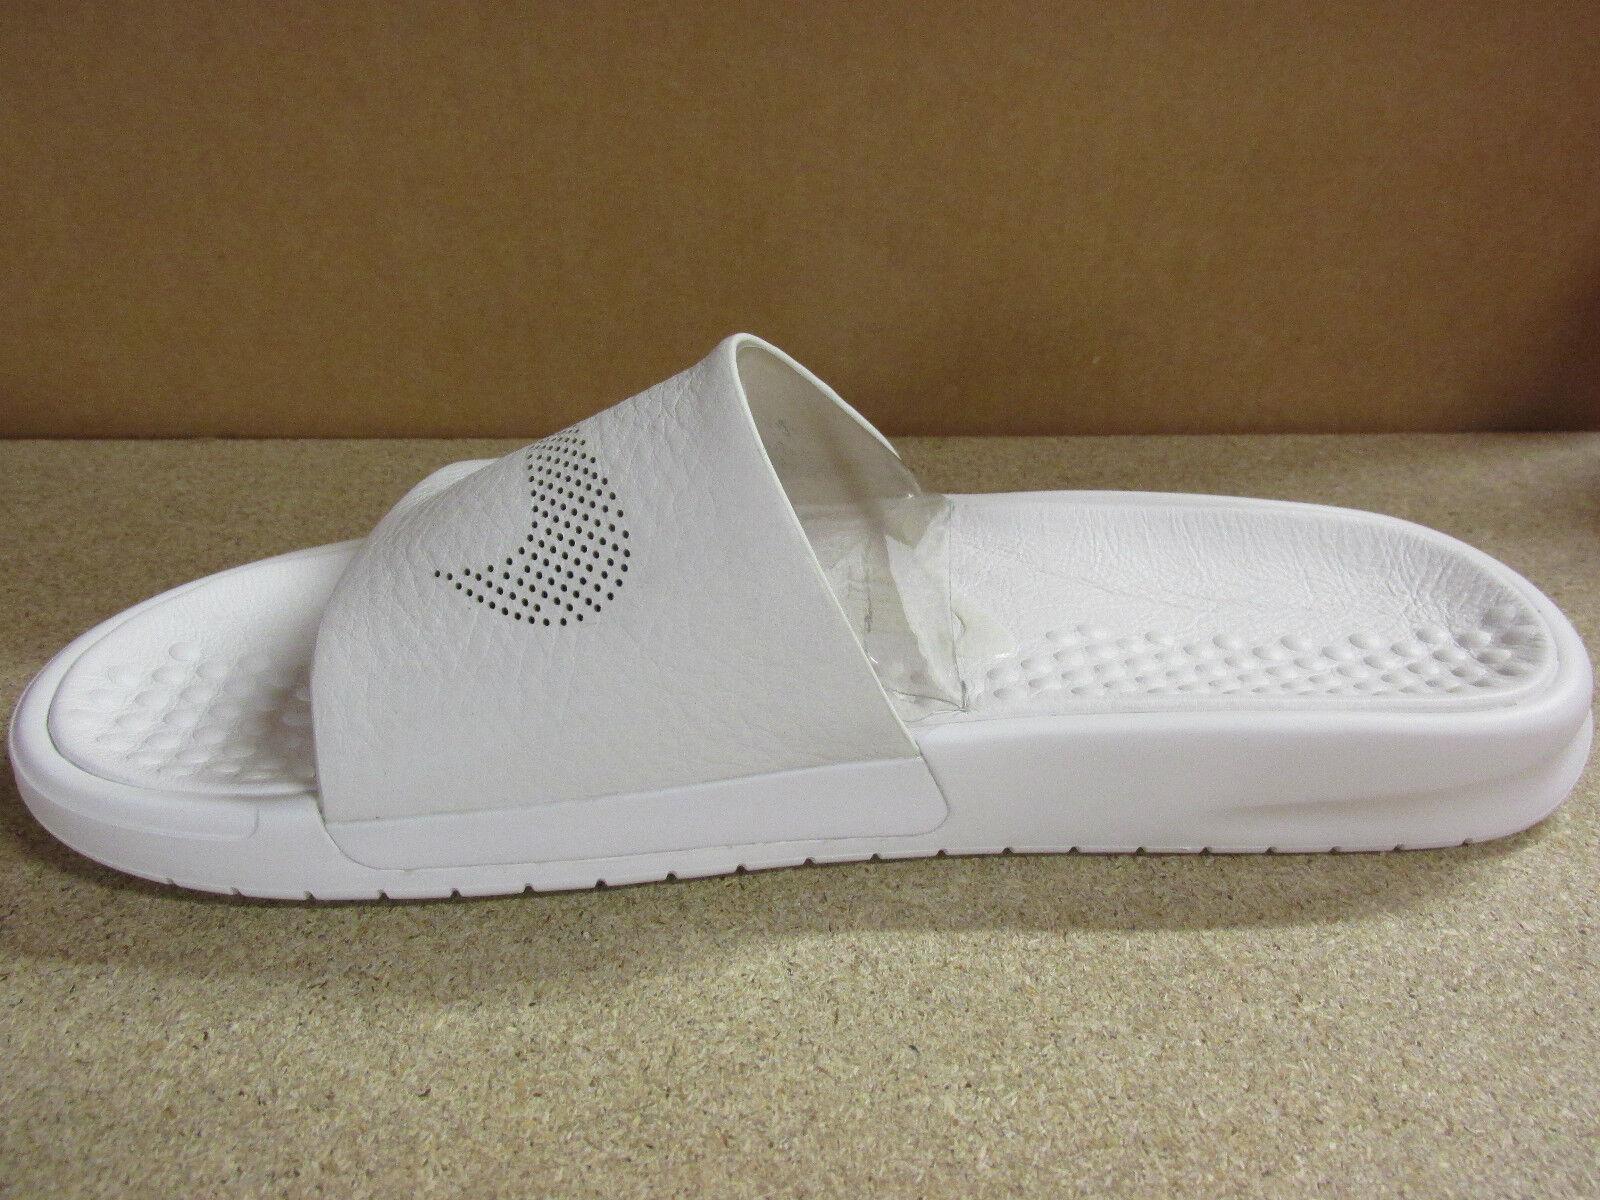 Nike NikeLab Benassi Mens Slide Lux - Size 9 Triple White 818742 100 for  sale online  398556c0d